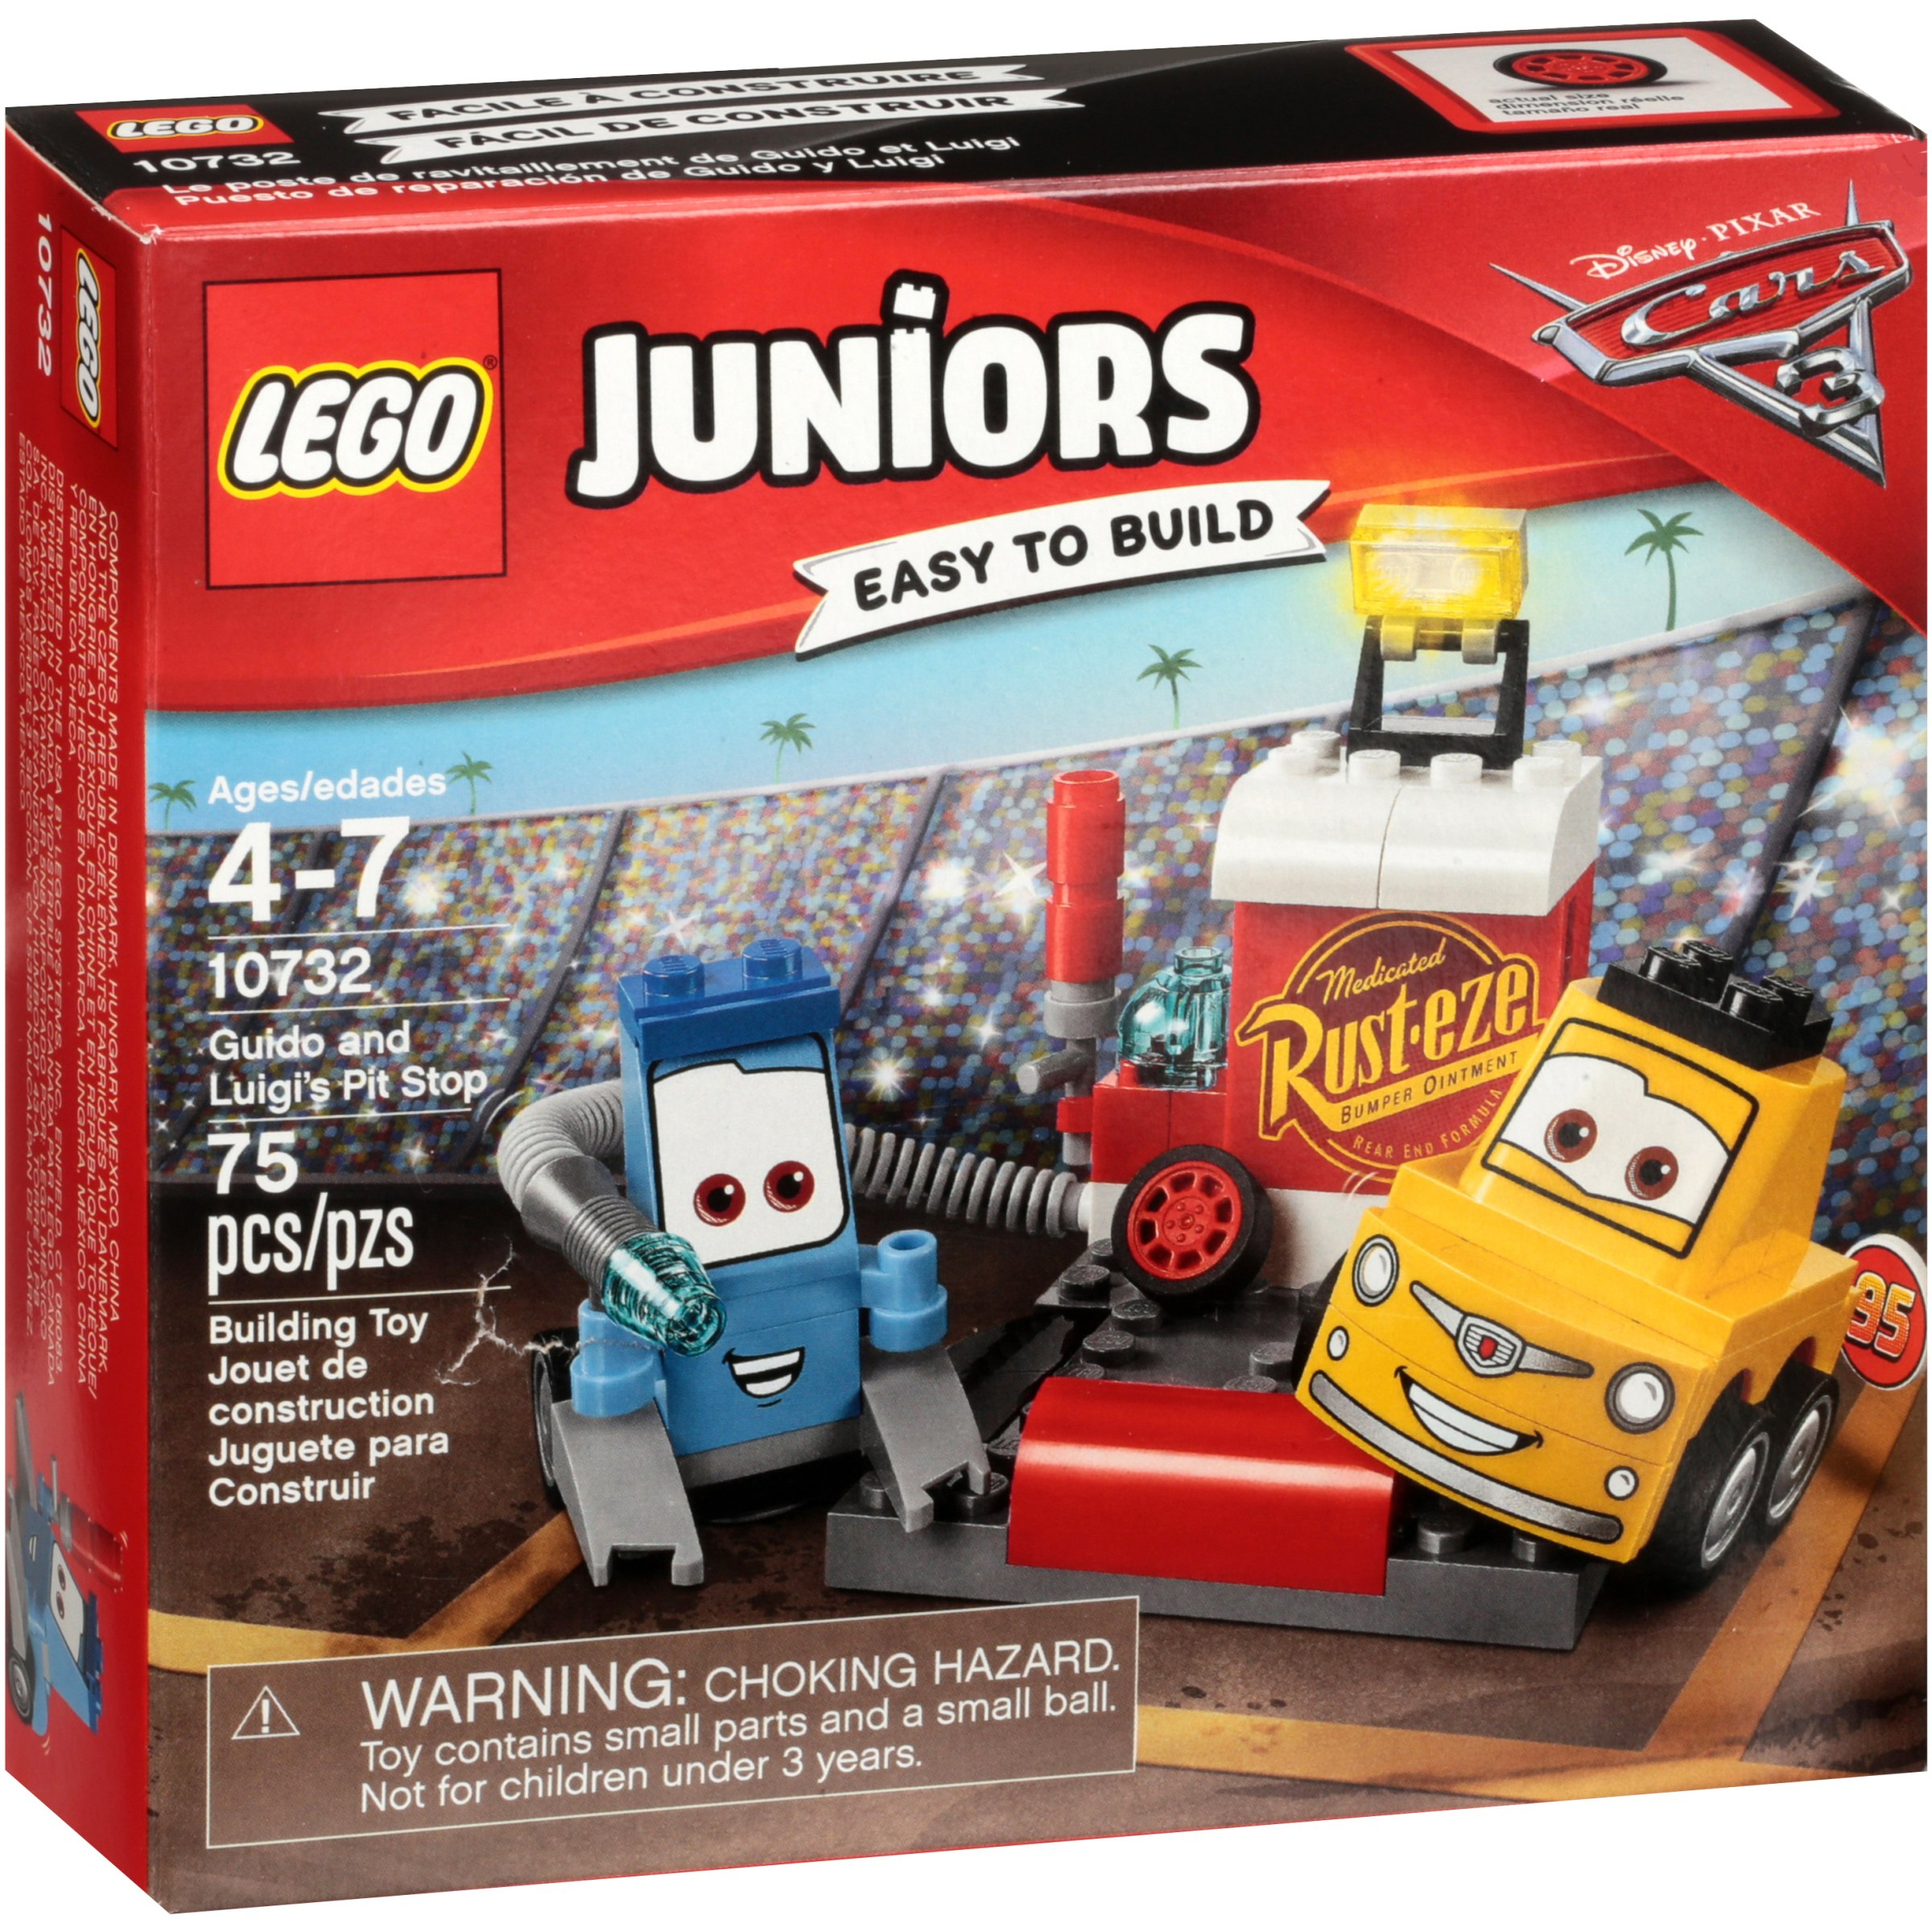 Lego® Juniors Disney Pixar Cars 3 Guido and Luigi's Pit Stop Building Toy 75 pc Box